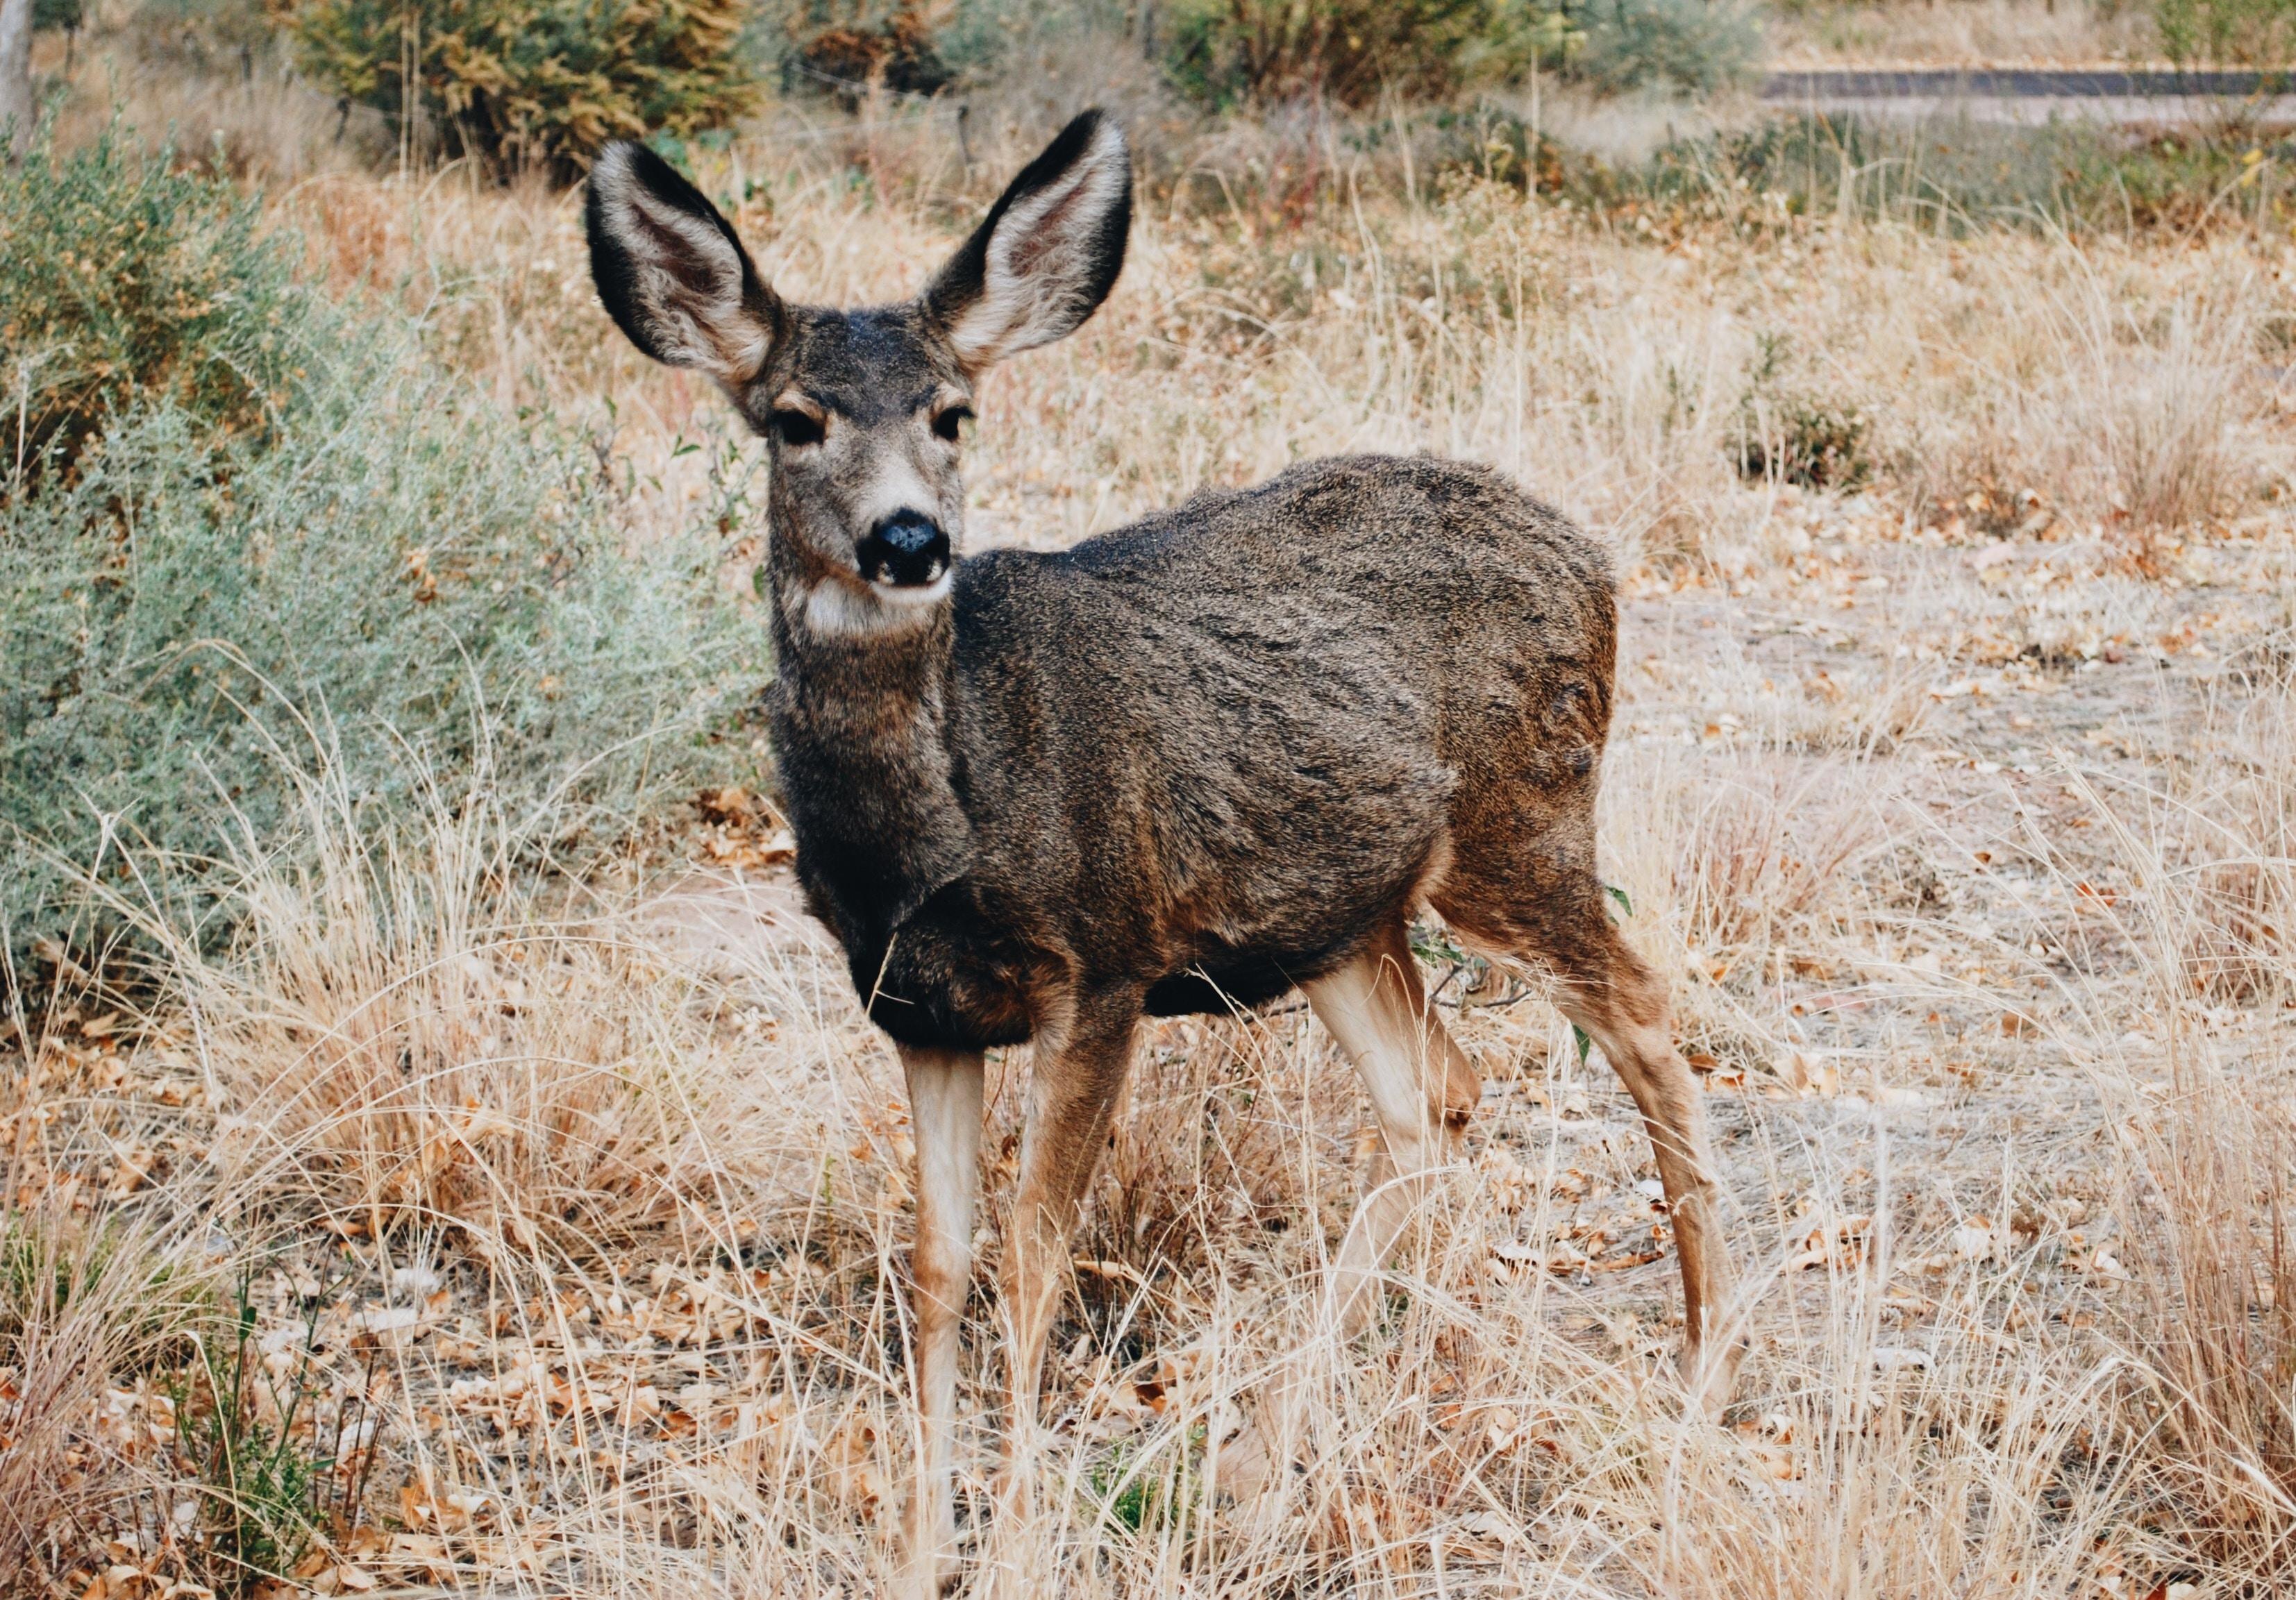 brown deer on grass at daytime